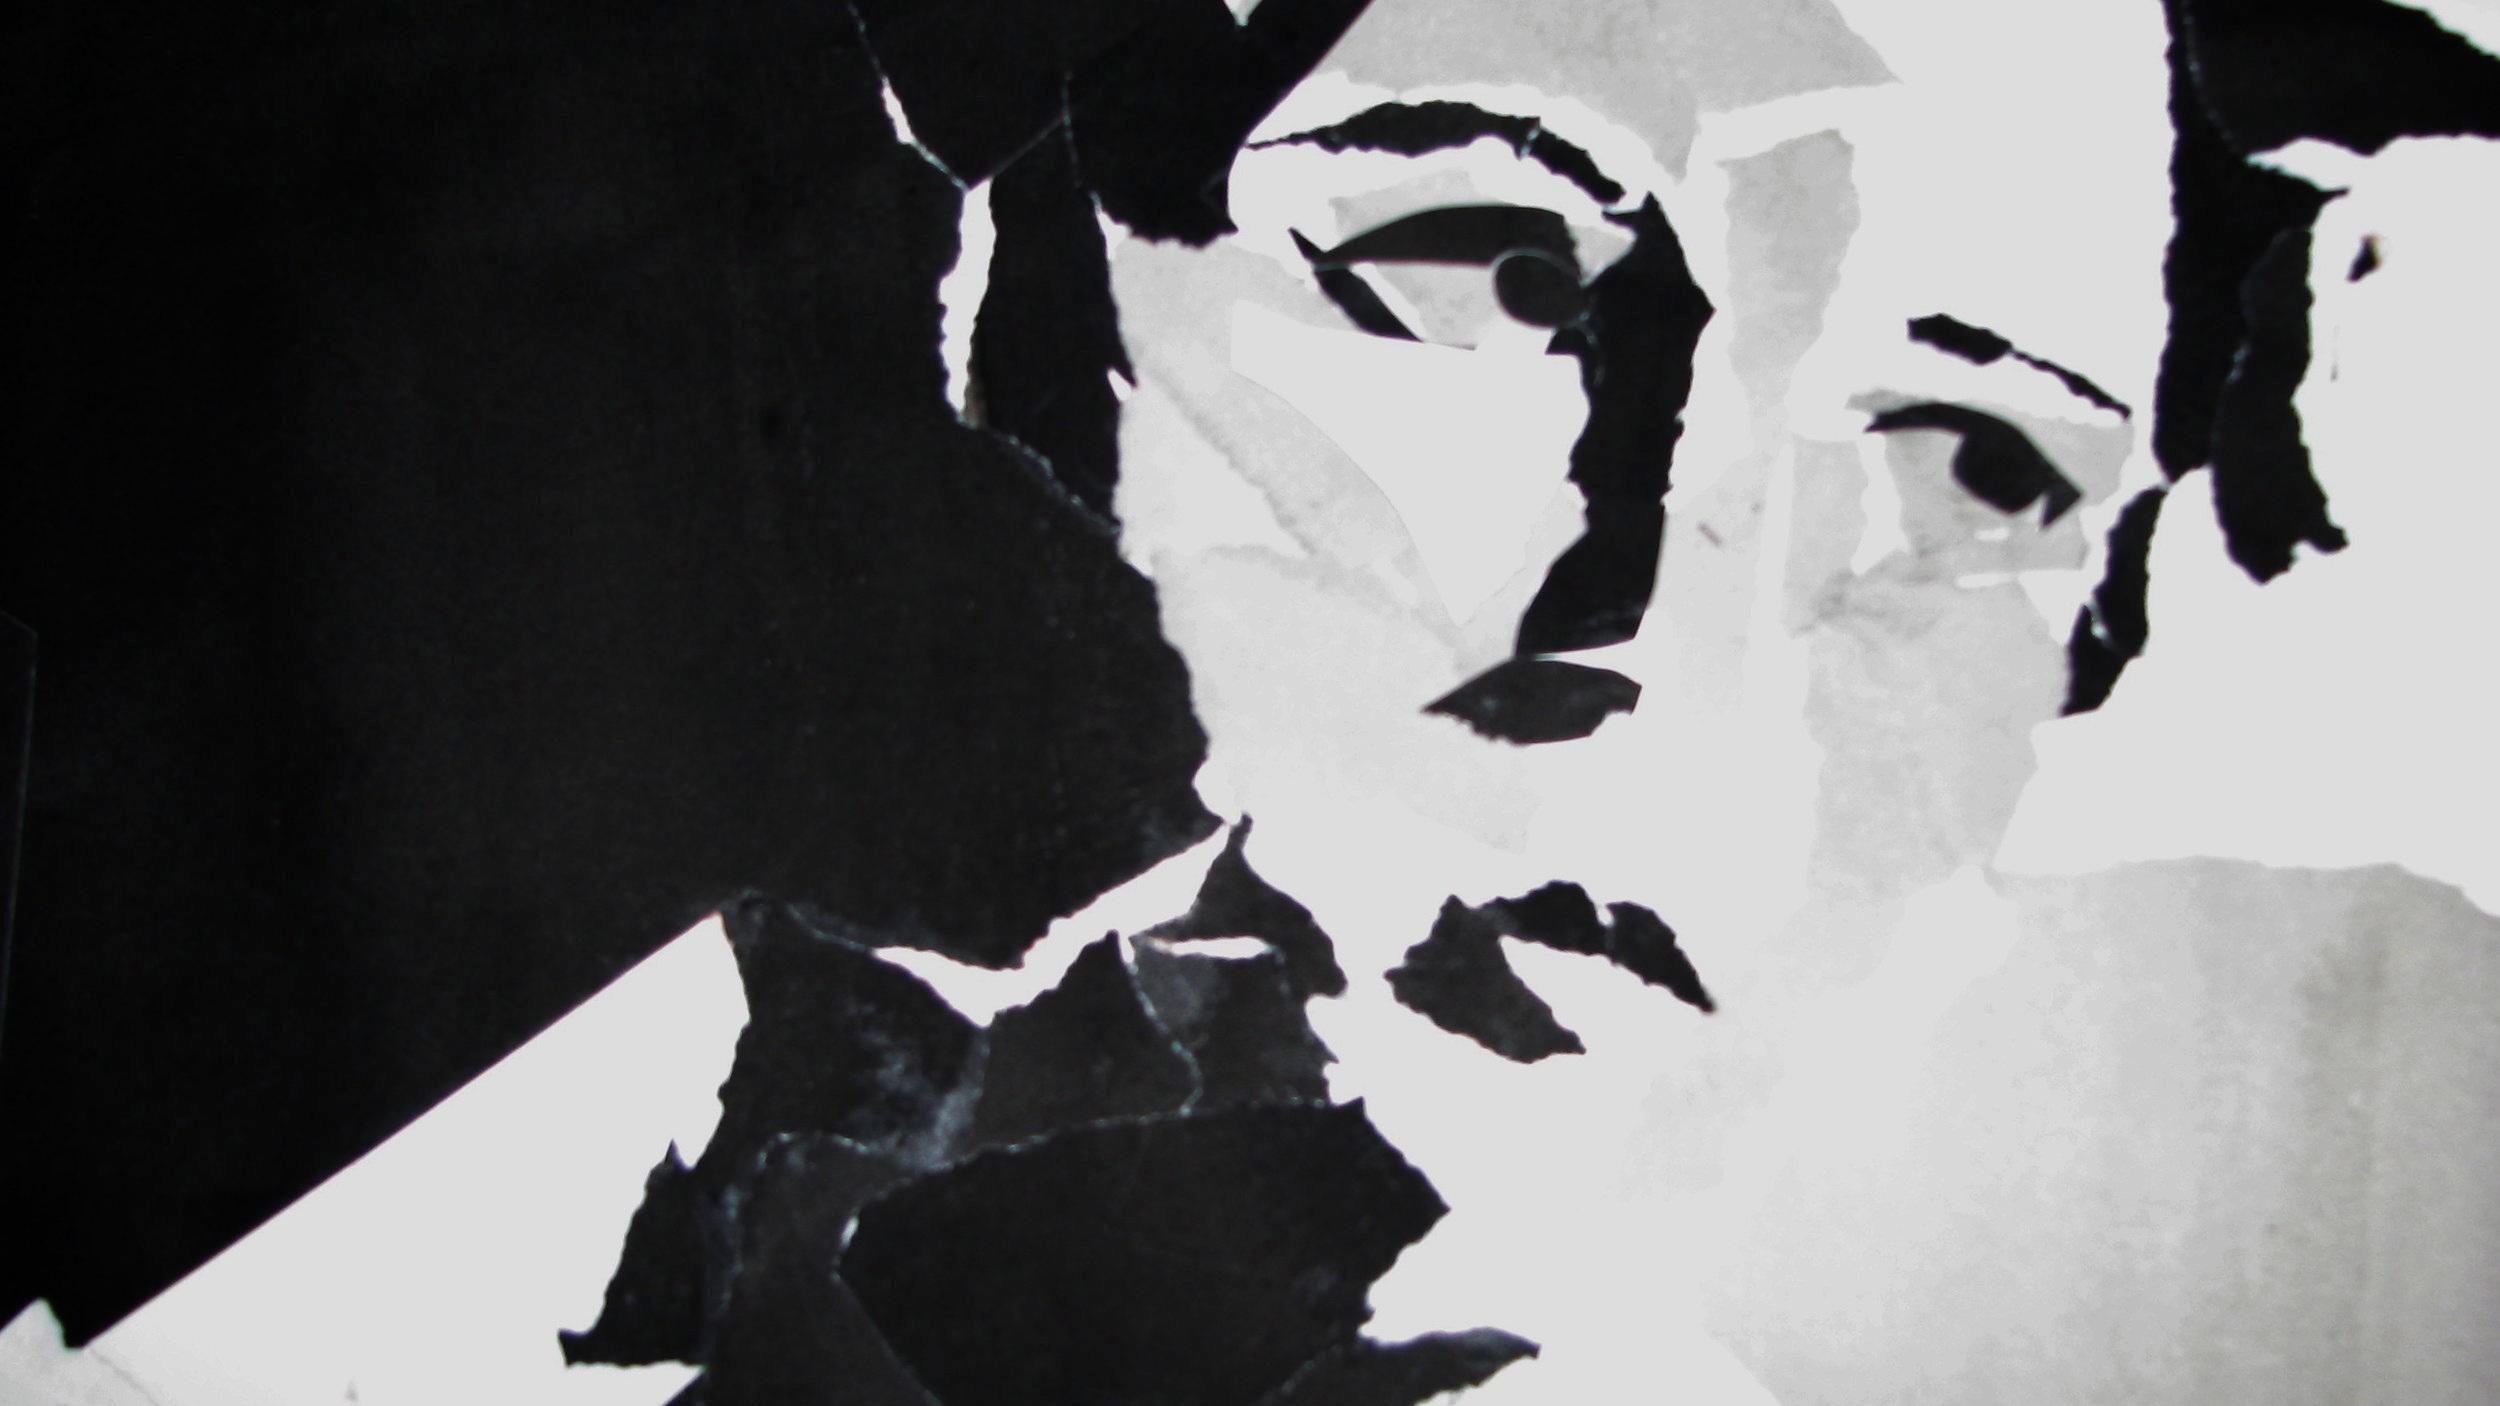 Monochrome landscape series - Intaglio Printmaking